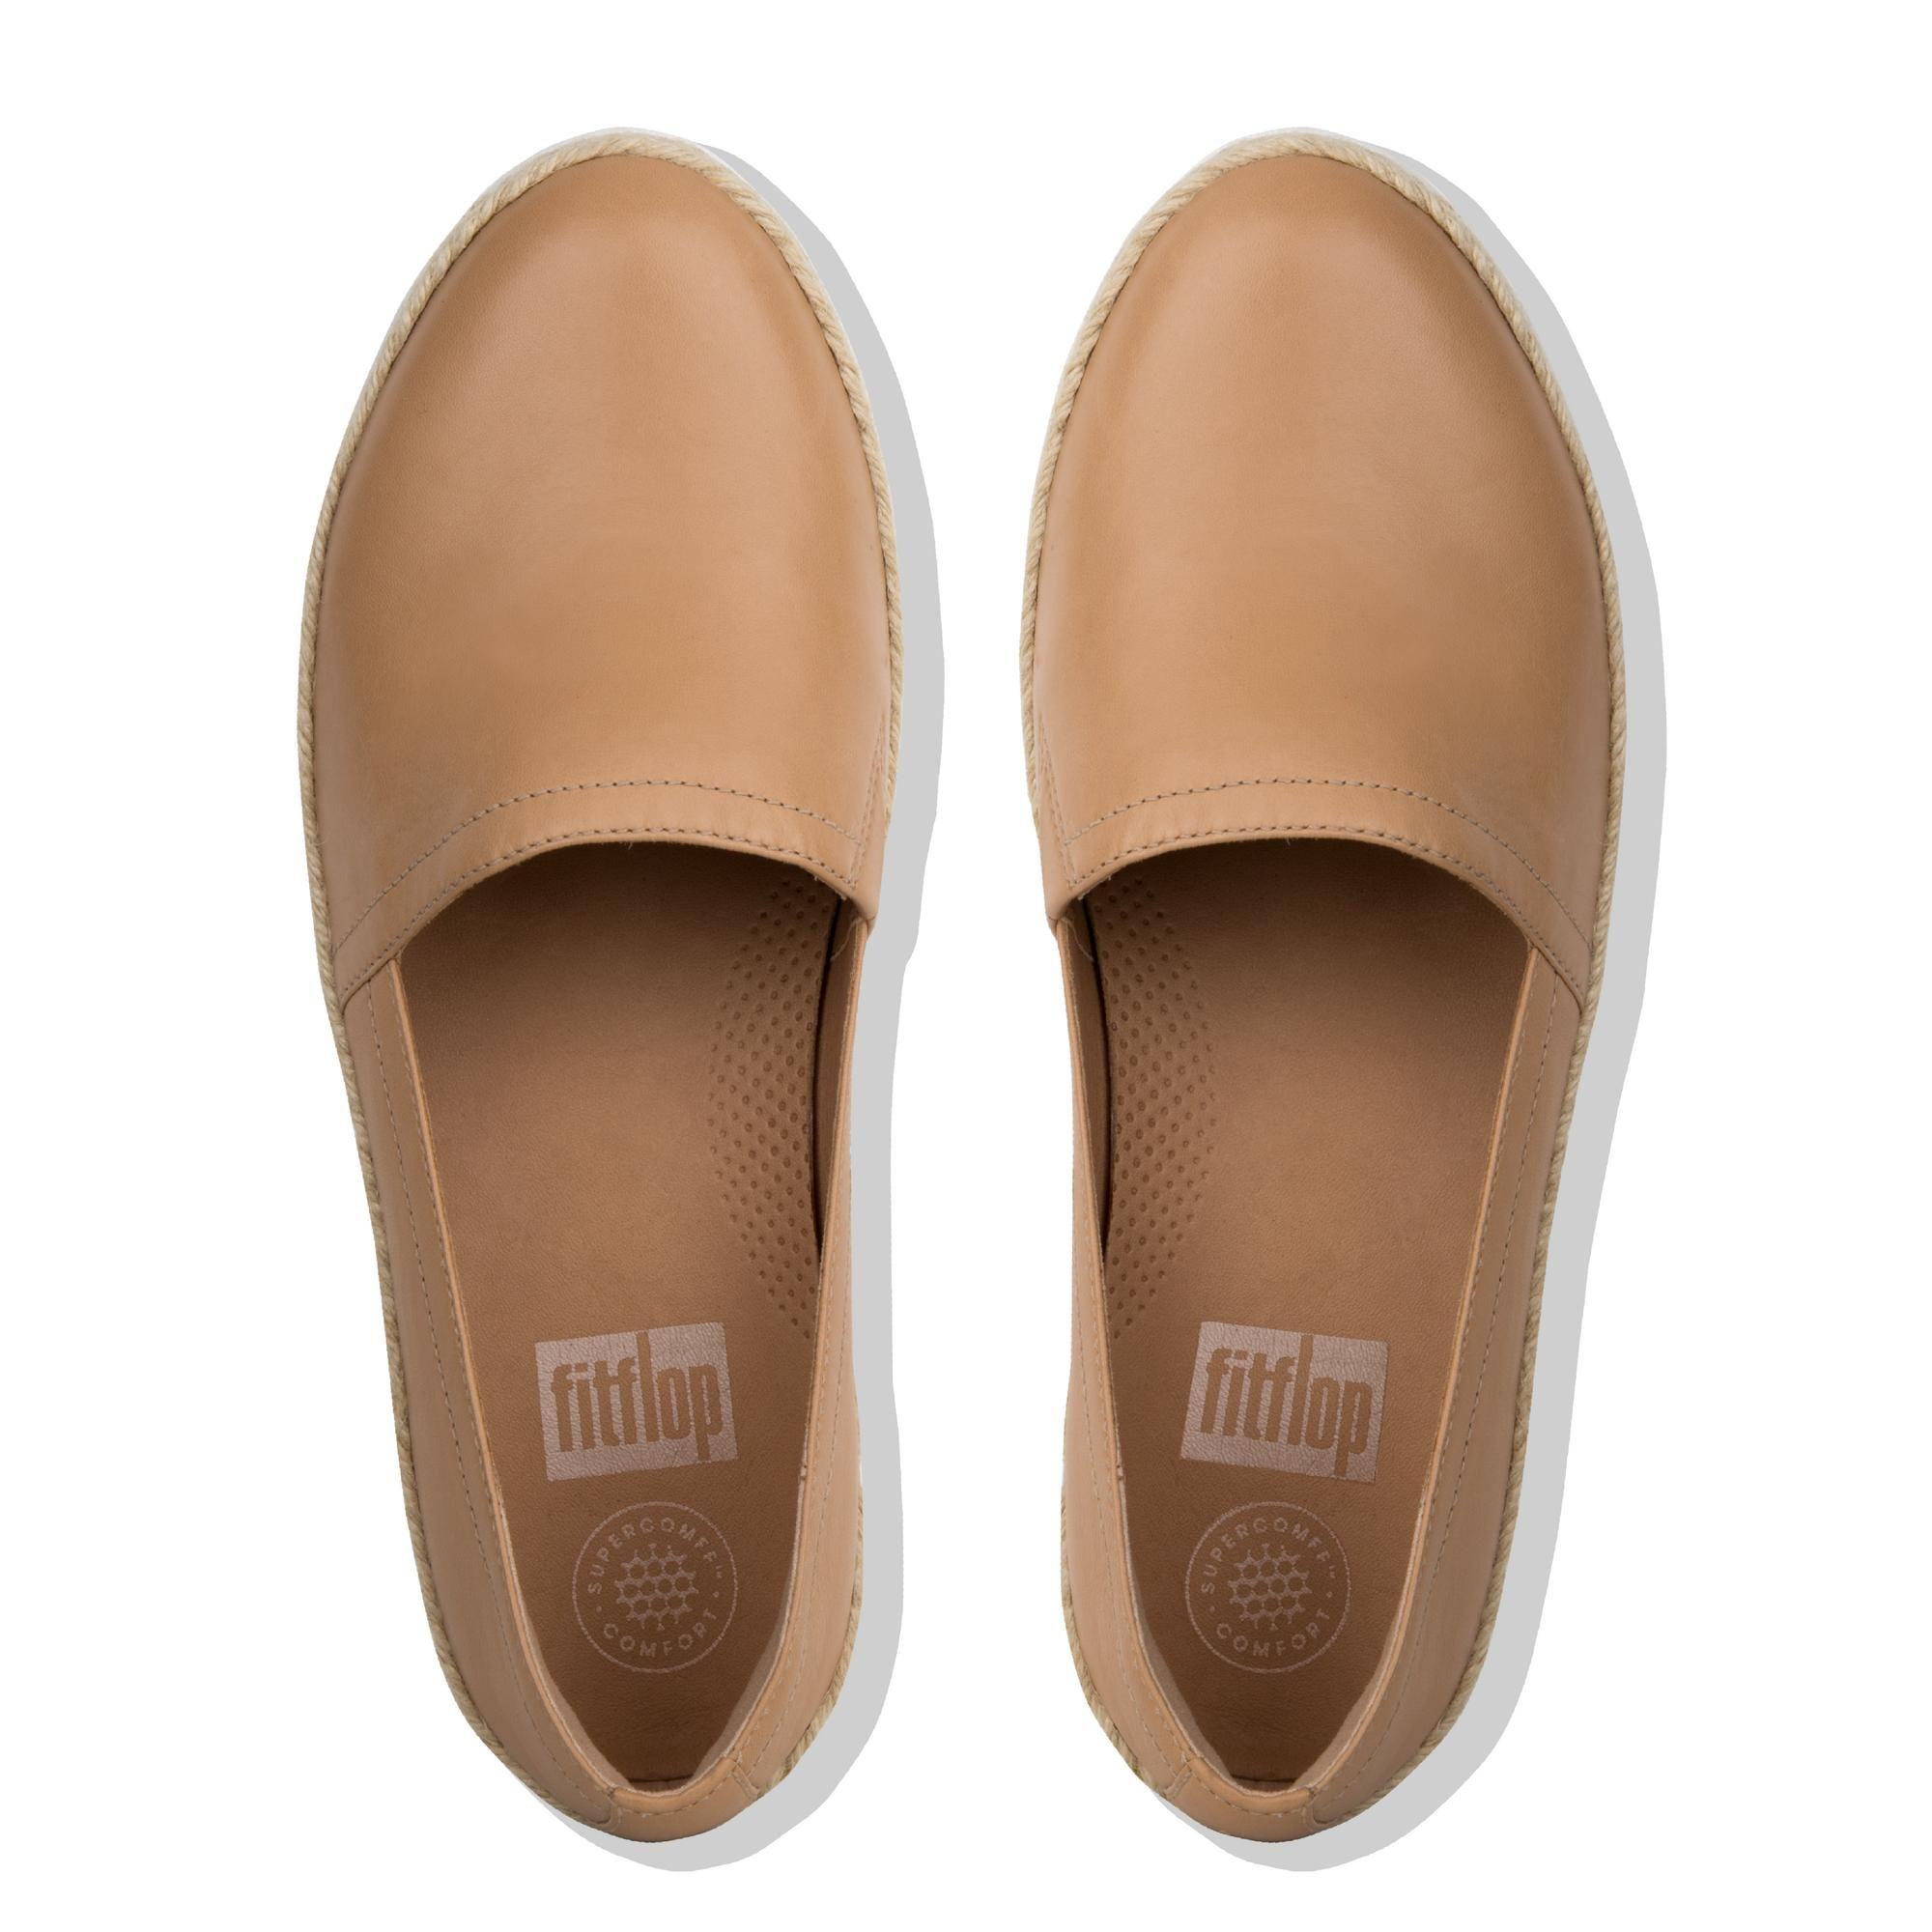 04043ea003b Women s Casa Leather Nude Fitflop